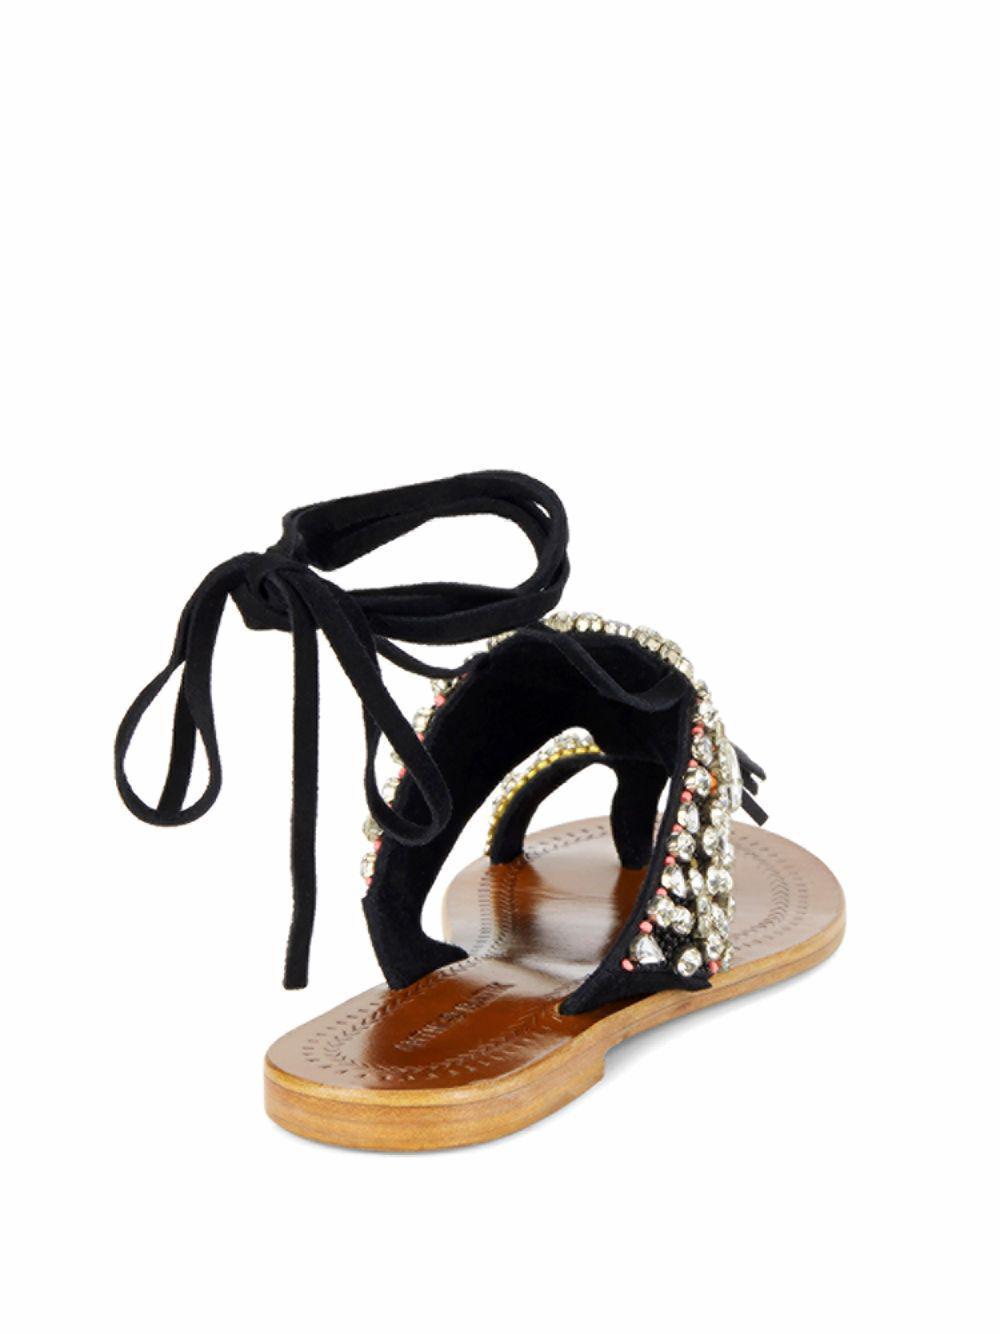 amazon countdown package sale online Antik Batik Leather Embellished Sandals oyYF9g